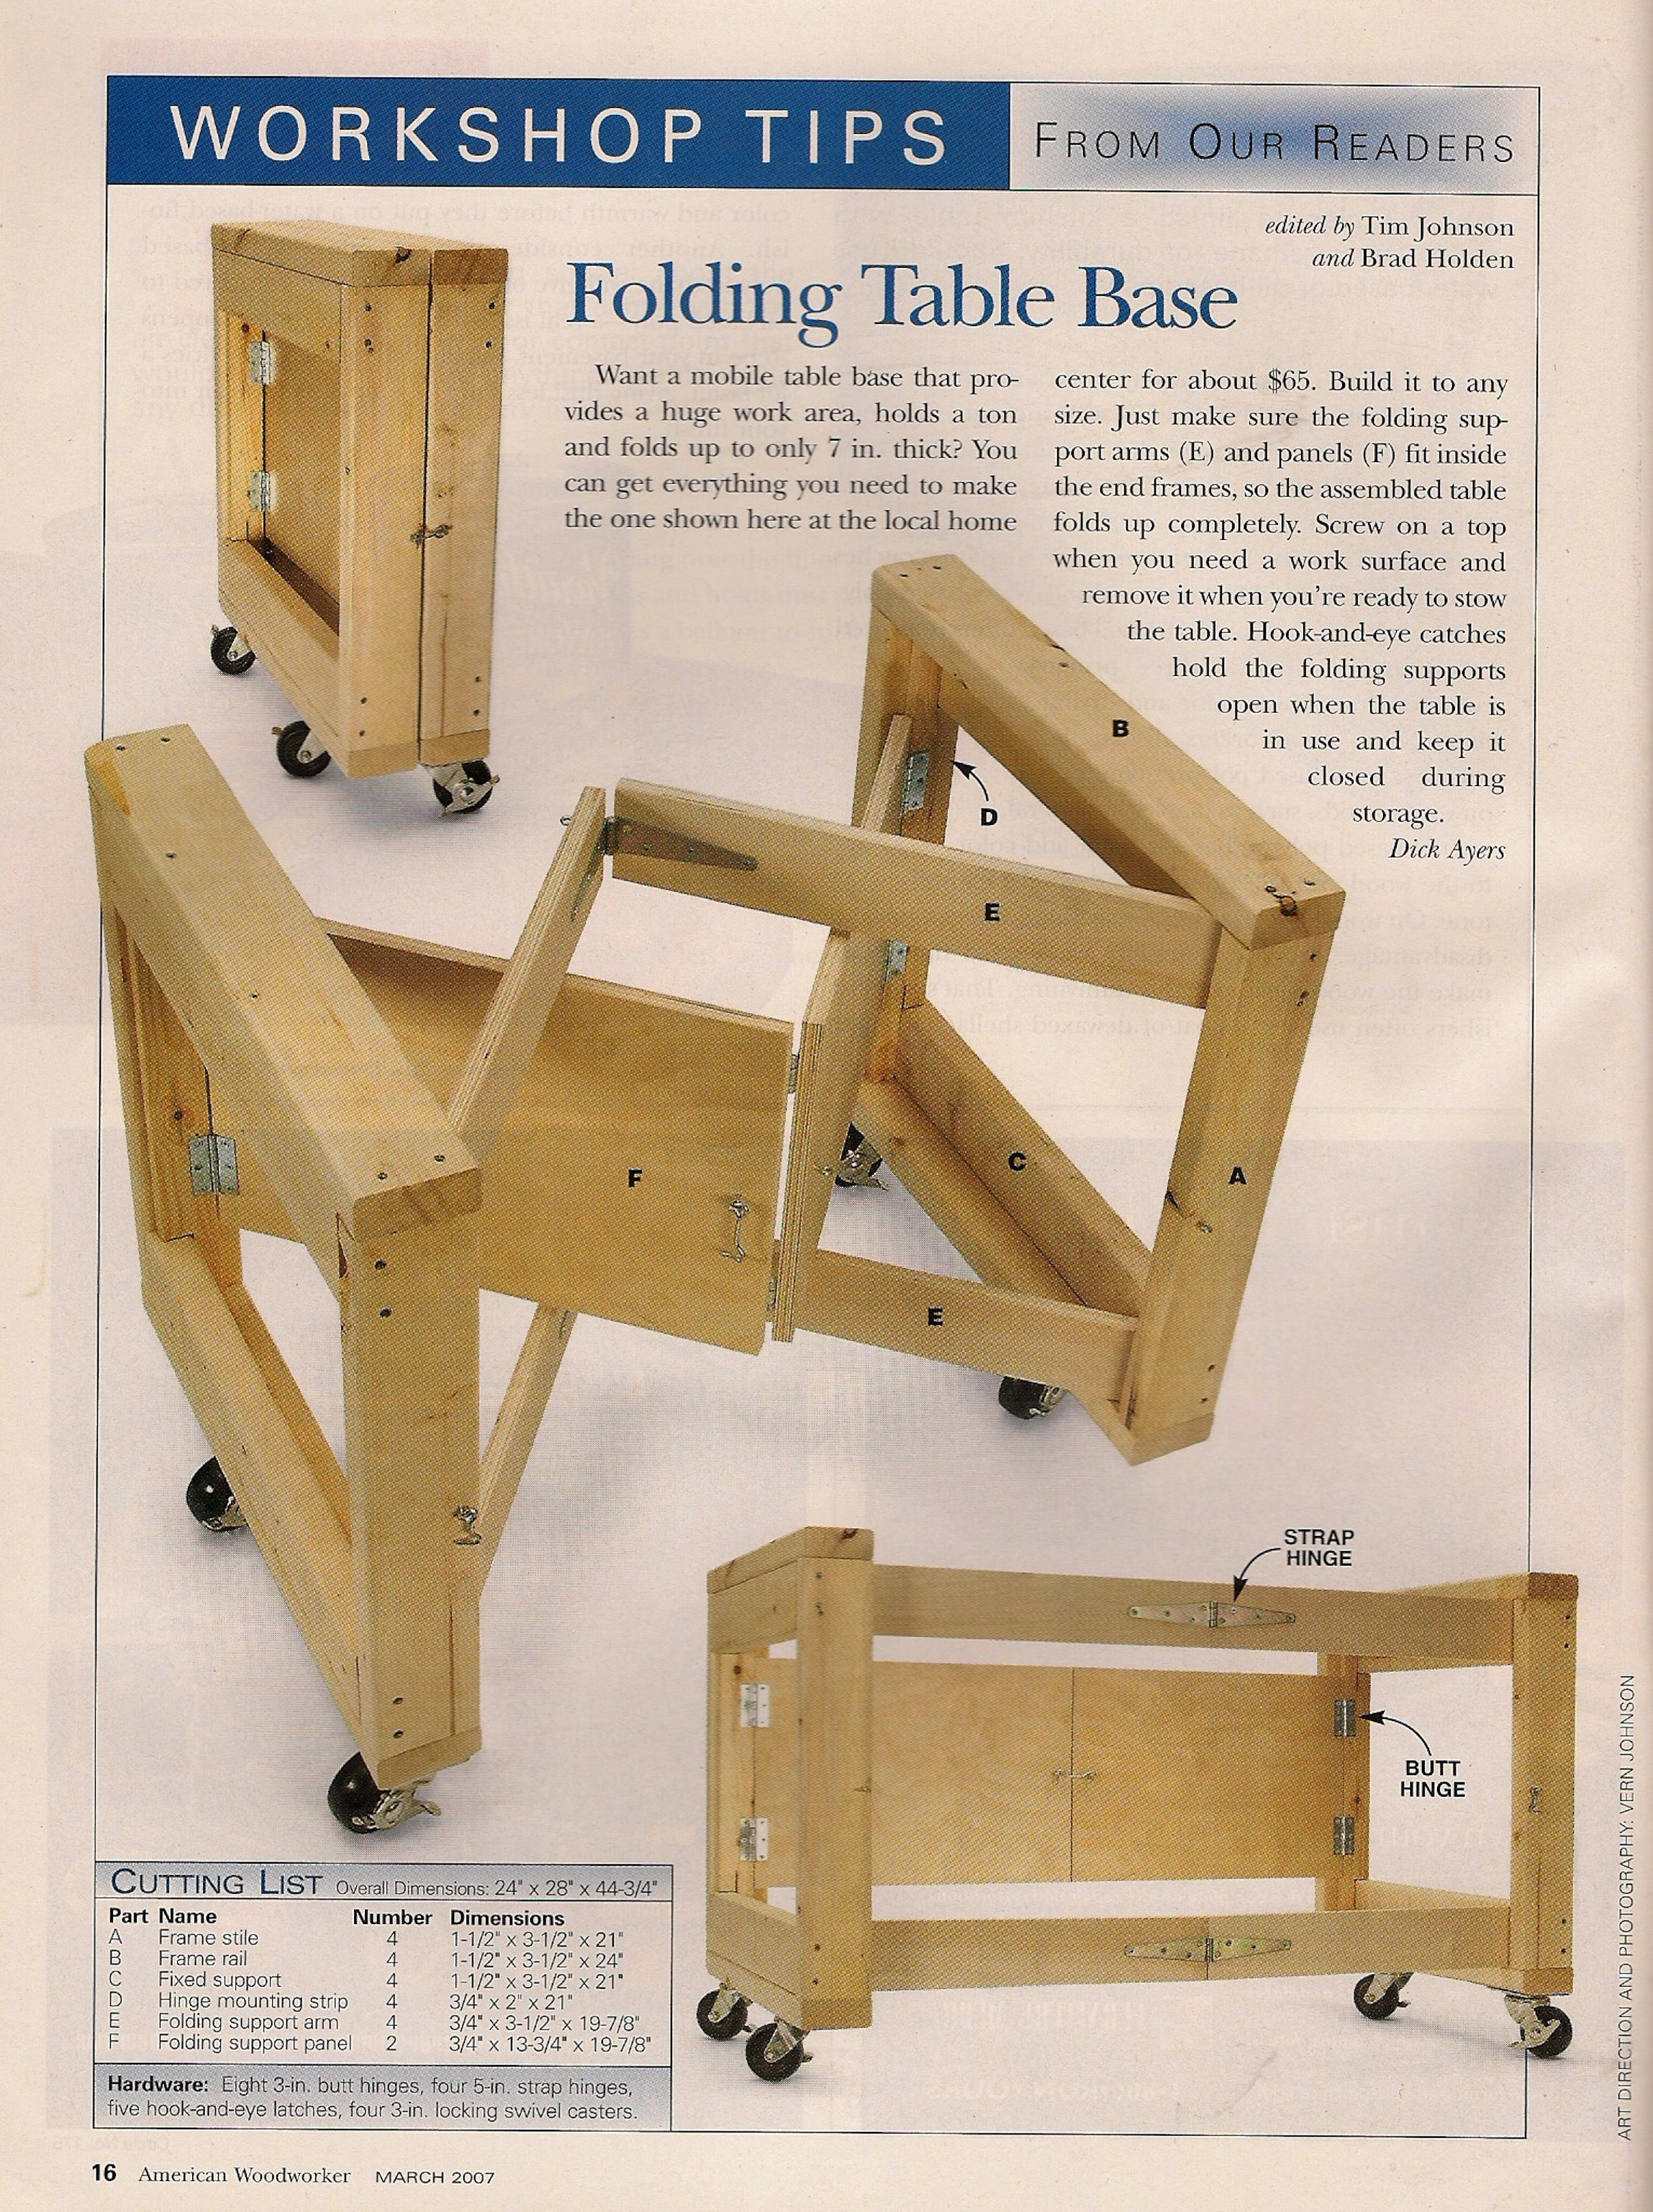 folding garage work table nice space saving idea for sorting